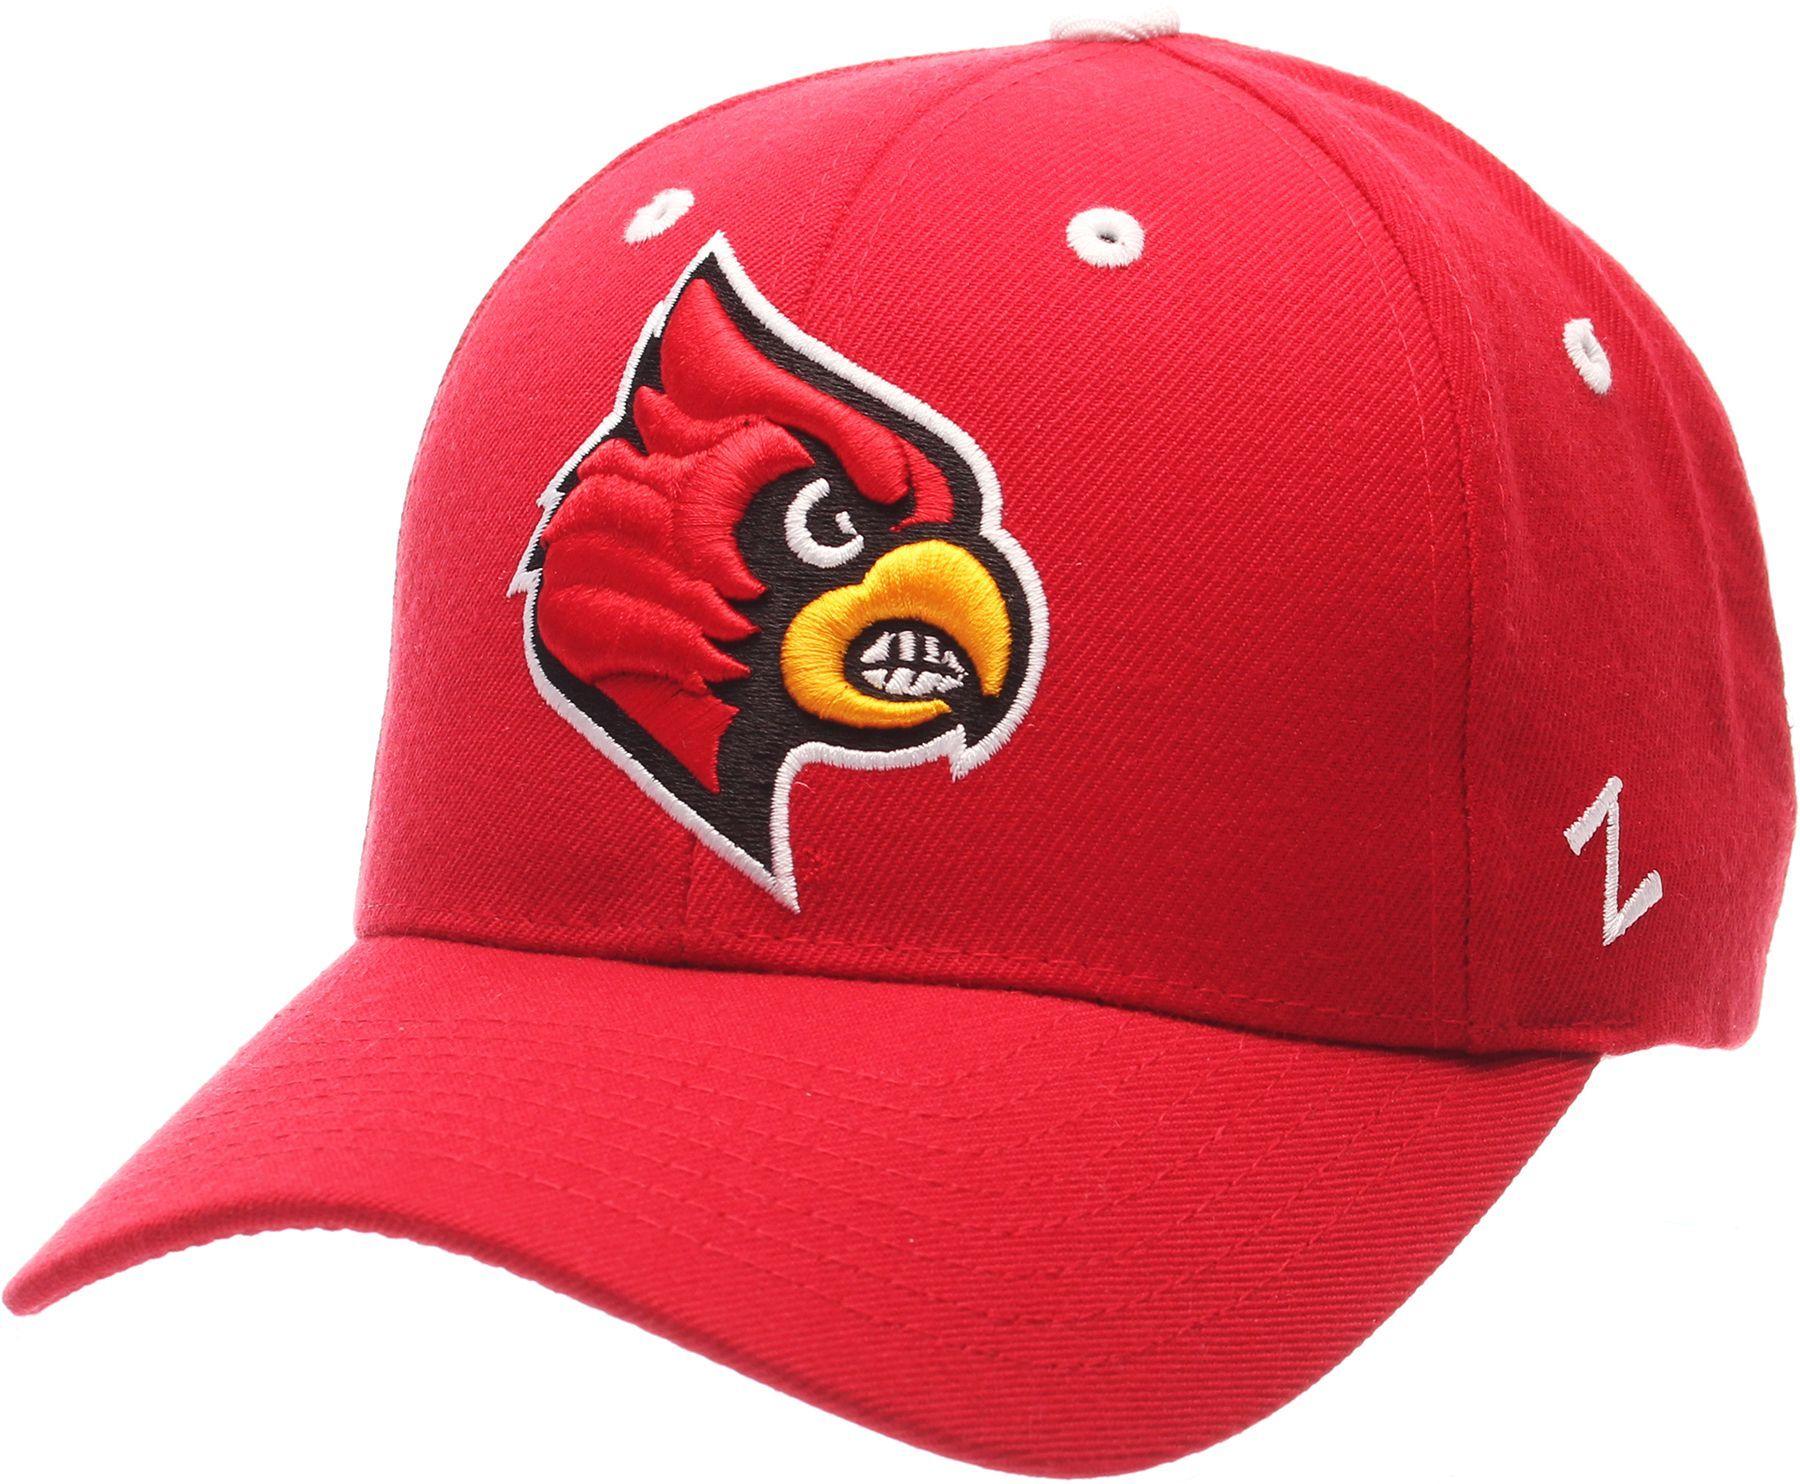 878e4d953d9f3d Zephyr Men's Louisville Cardinals Cardinal Red Competitor Adjustable ...